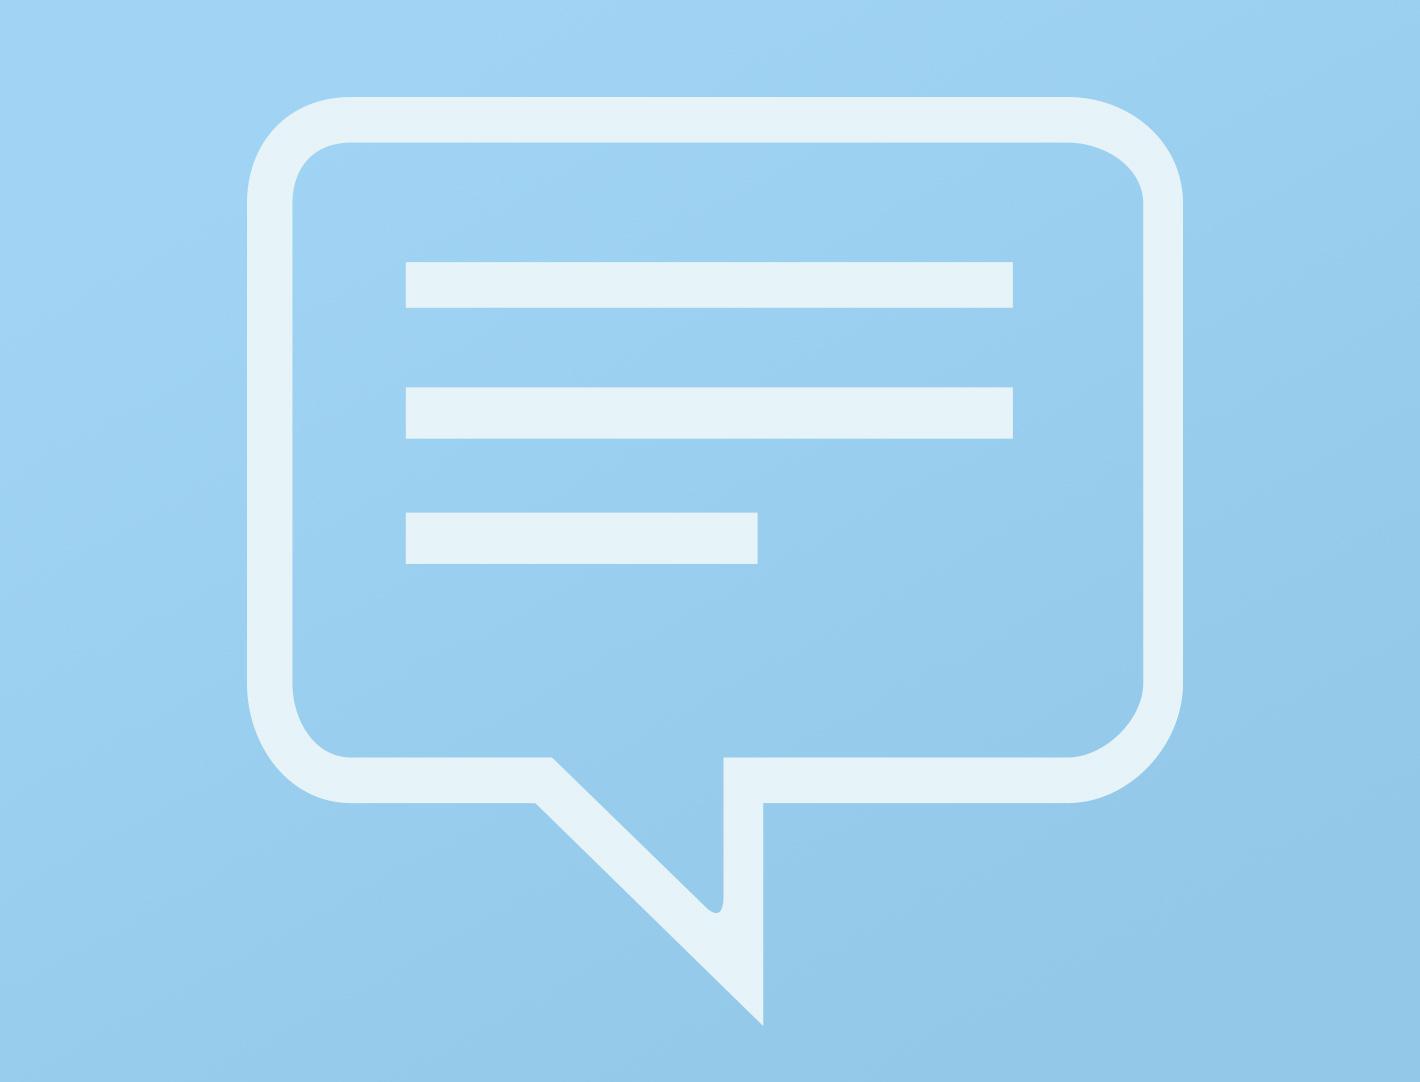 Company info, address and telephone number - Sedo com